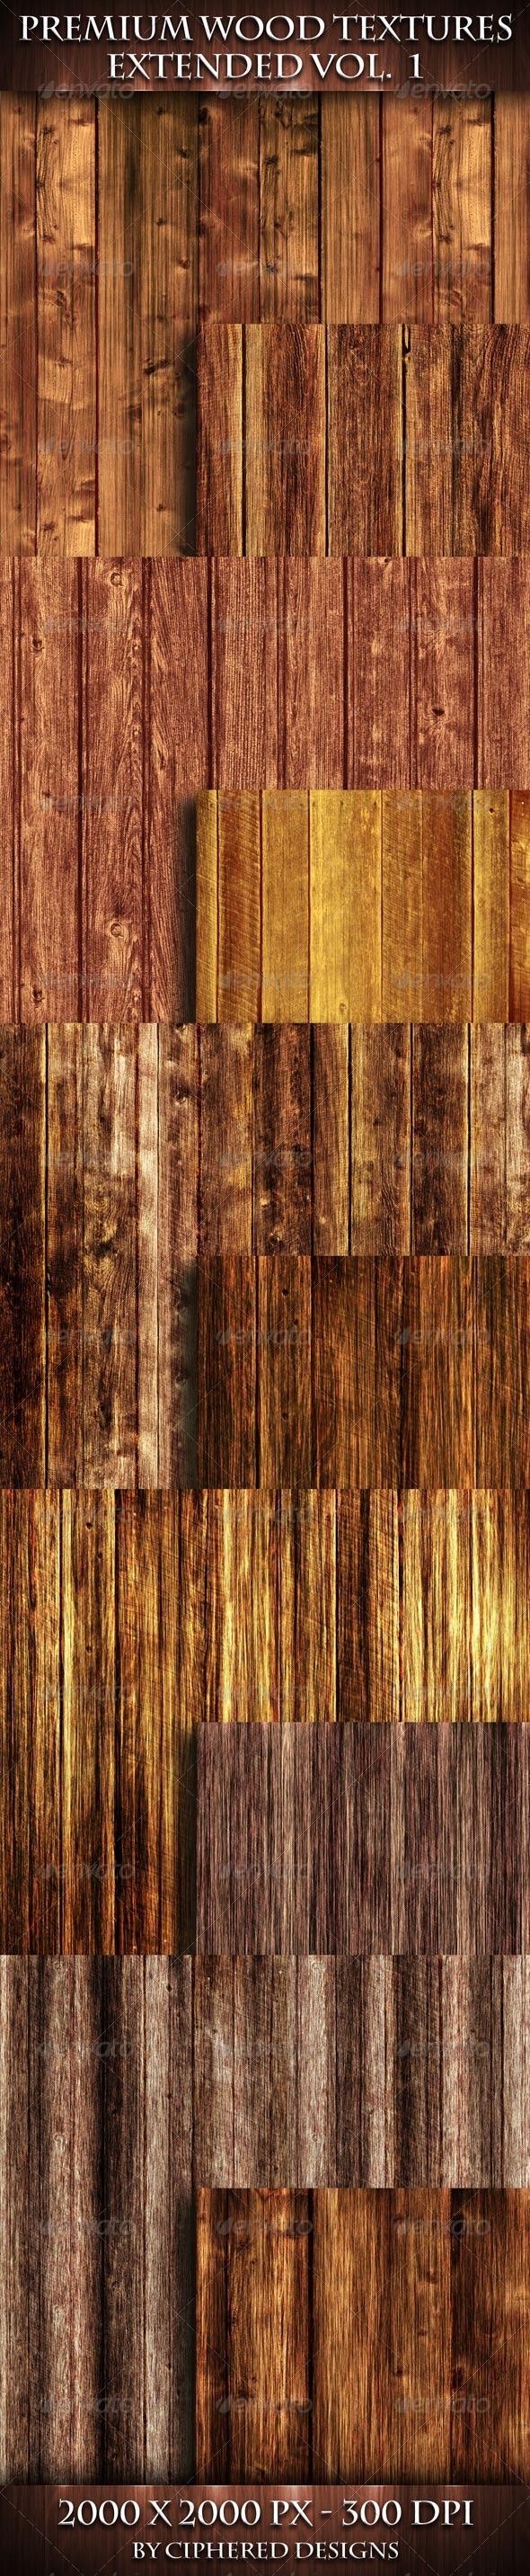 Premium Wood Textures Extended - Vol. 1 - Wood Textures